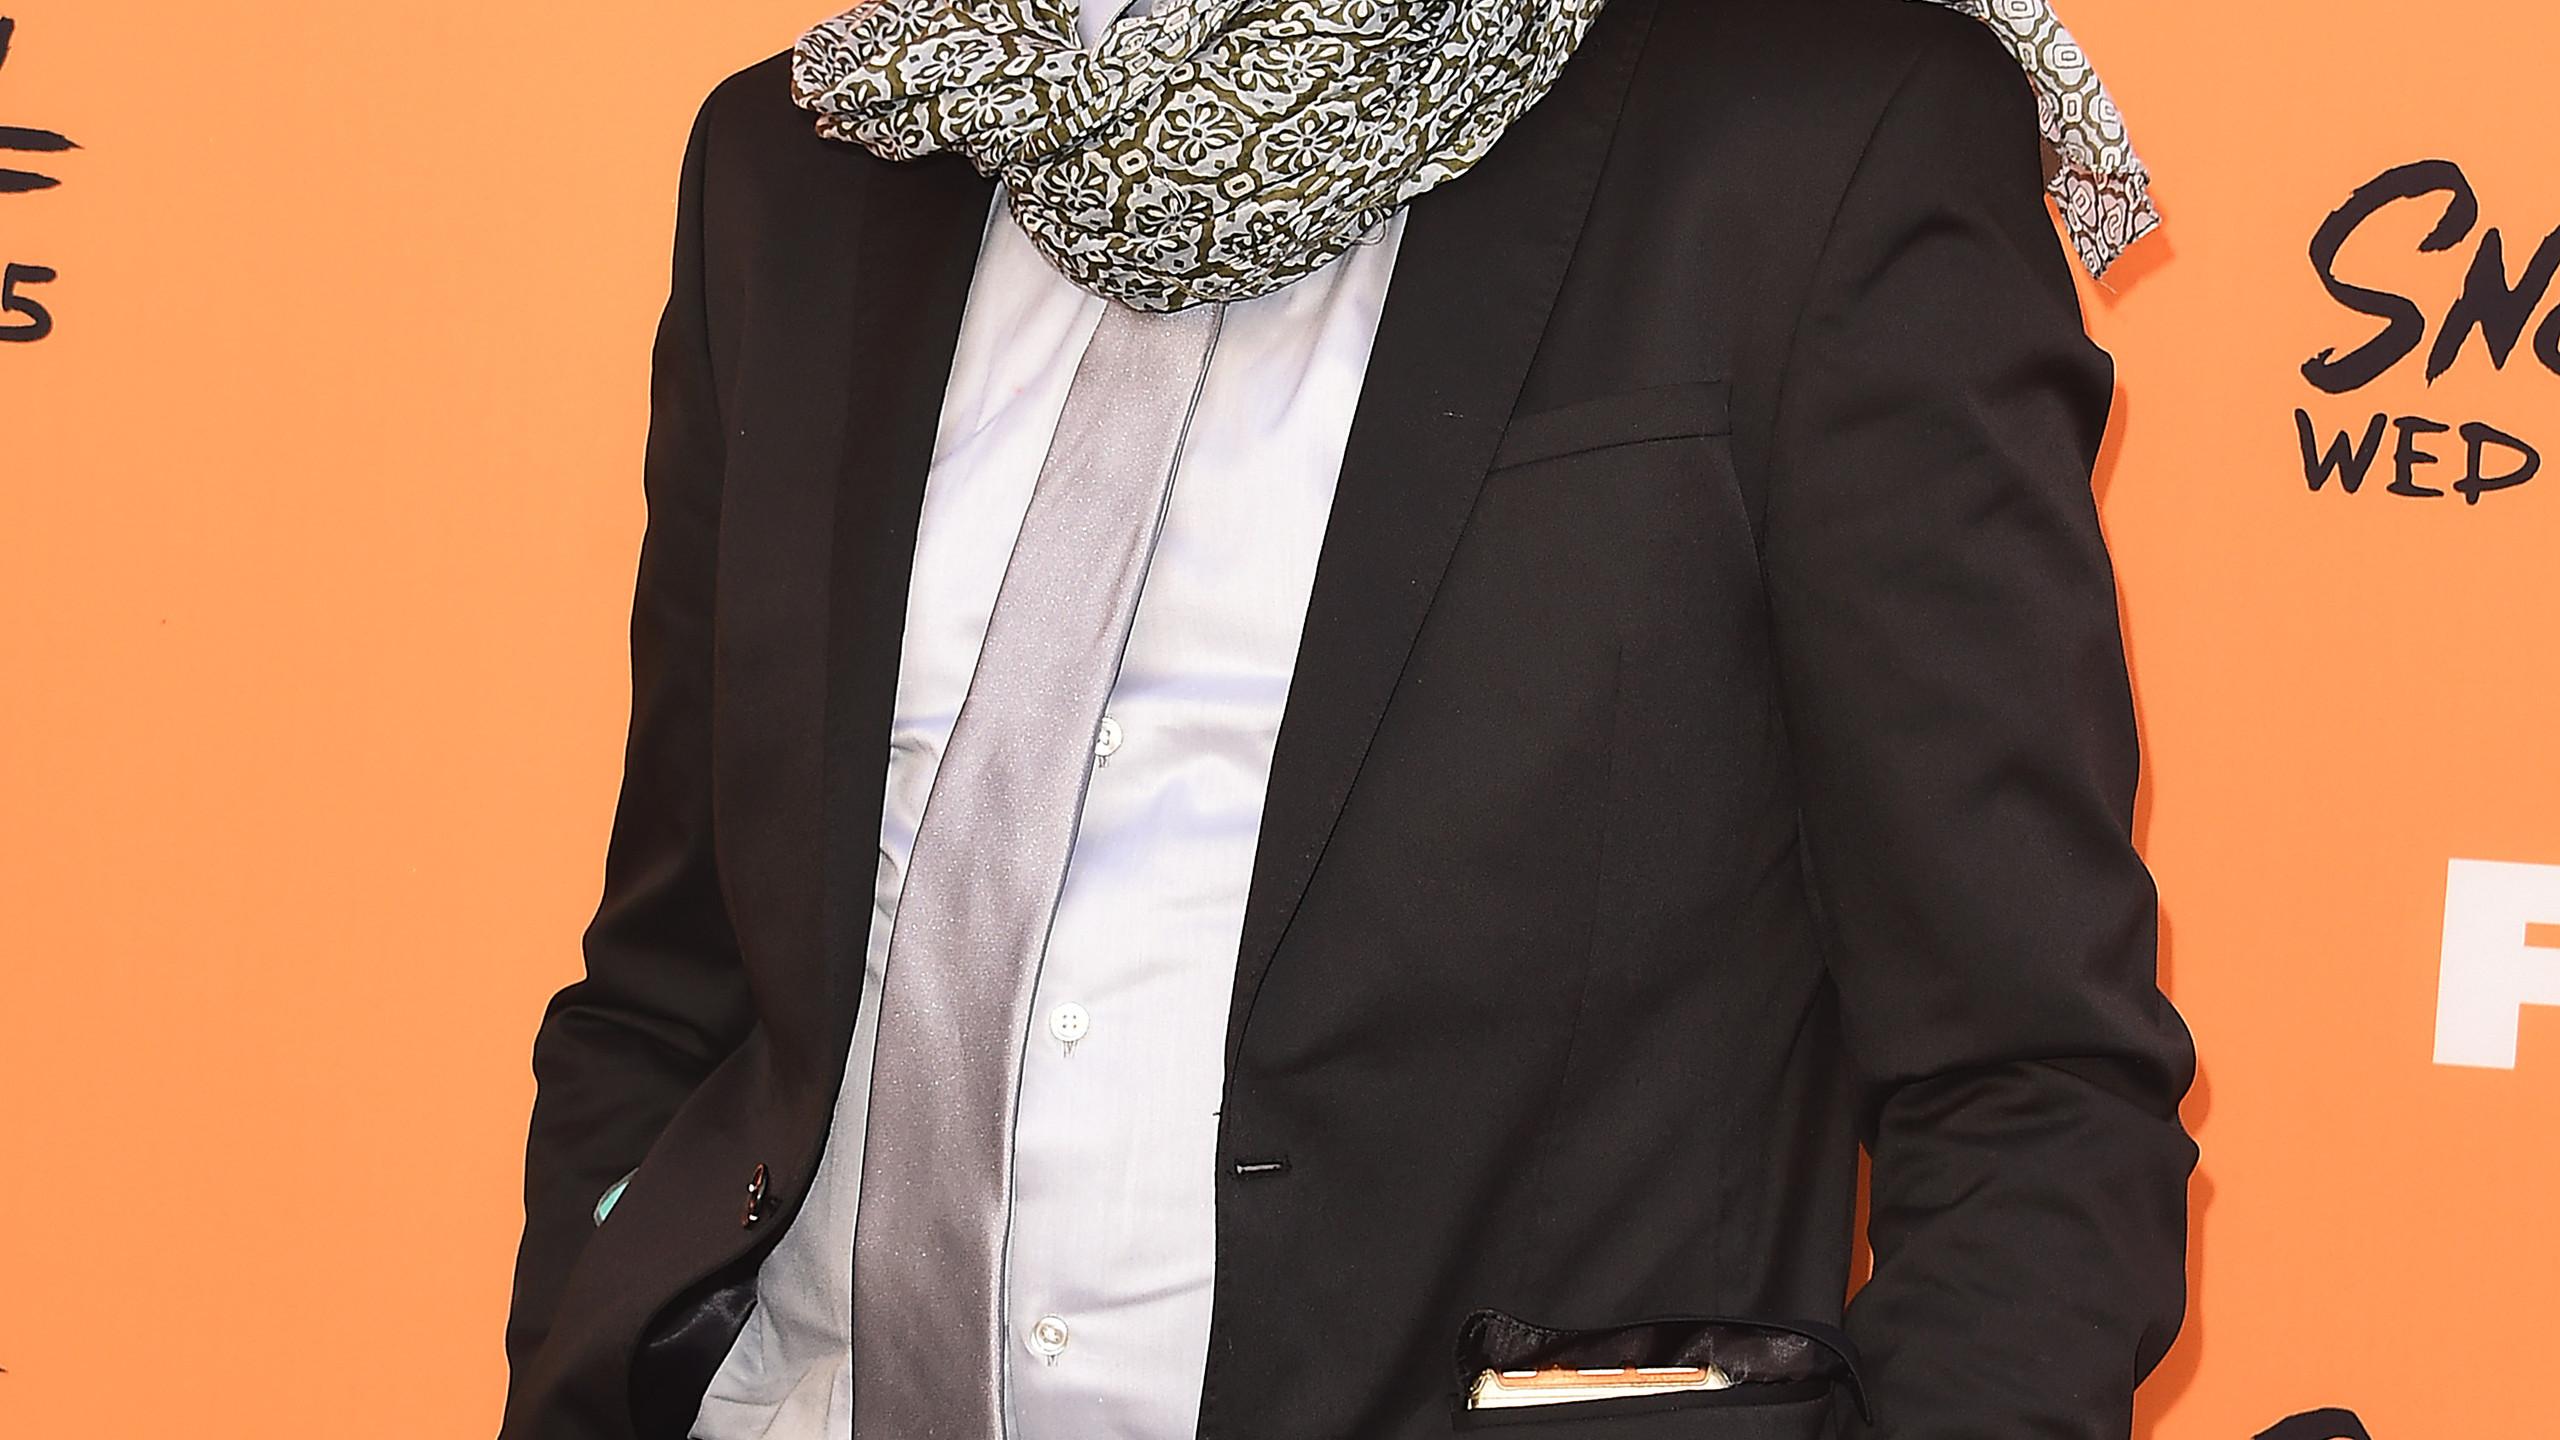 Amon Moni Aboutboul